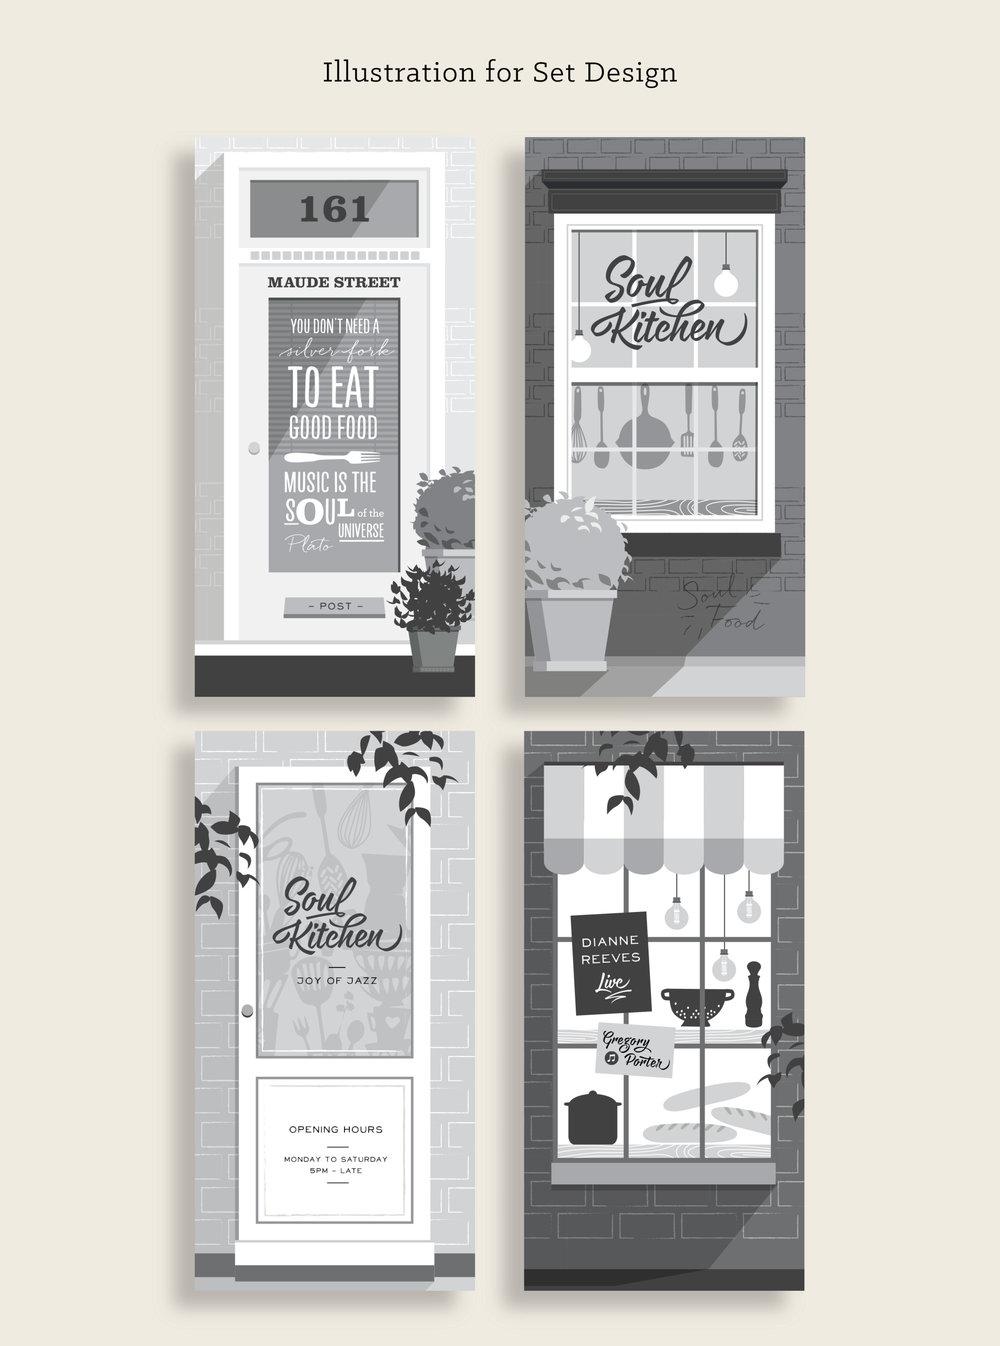 Amazing Kirks Soul Kitchen Image - Kitchen Cabinets   Ideas ...